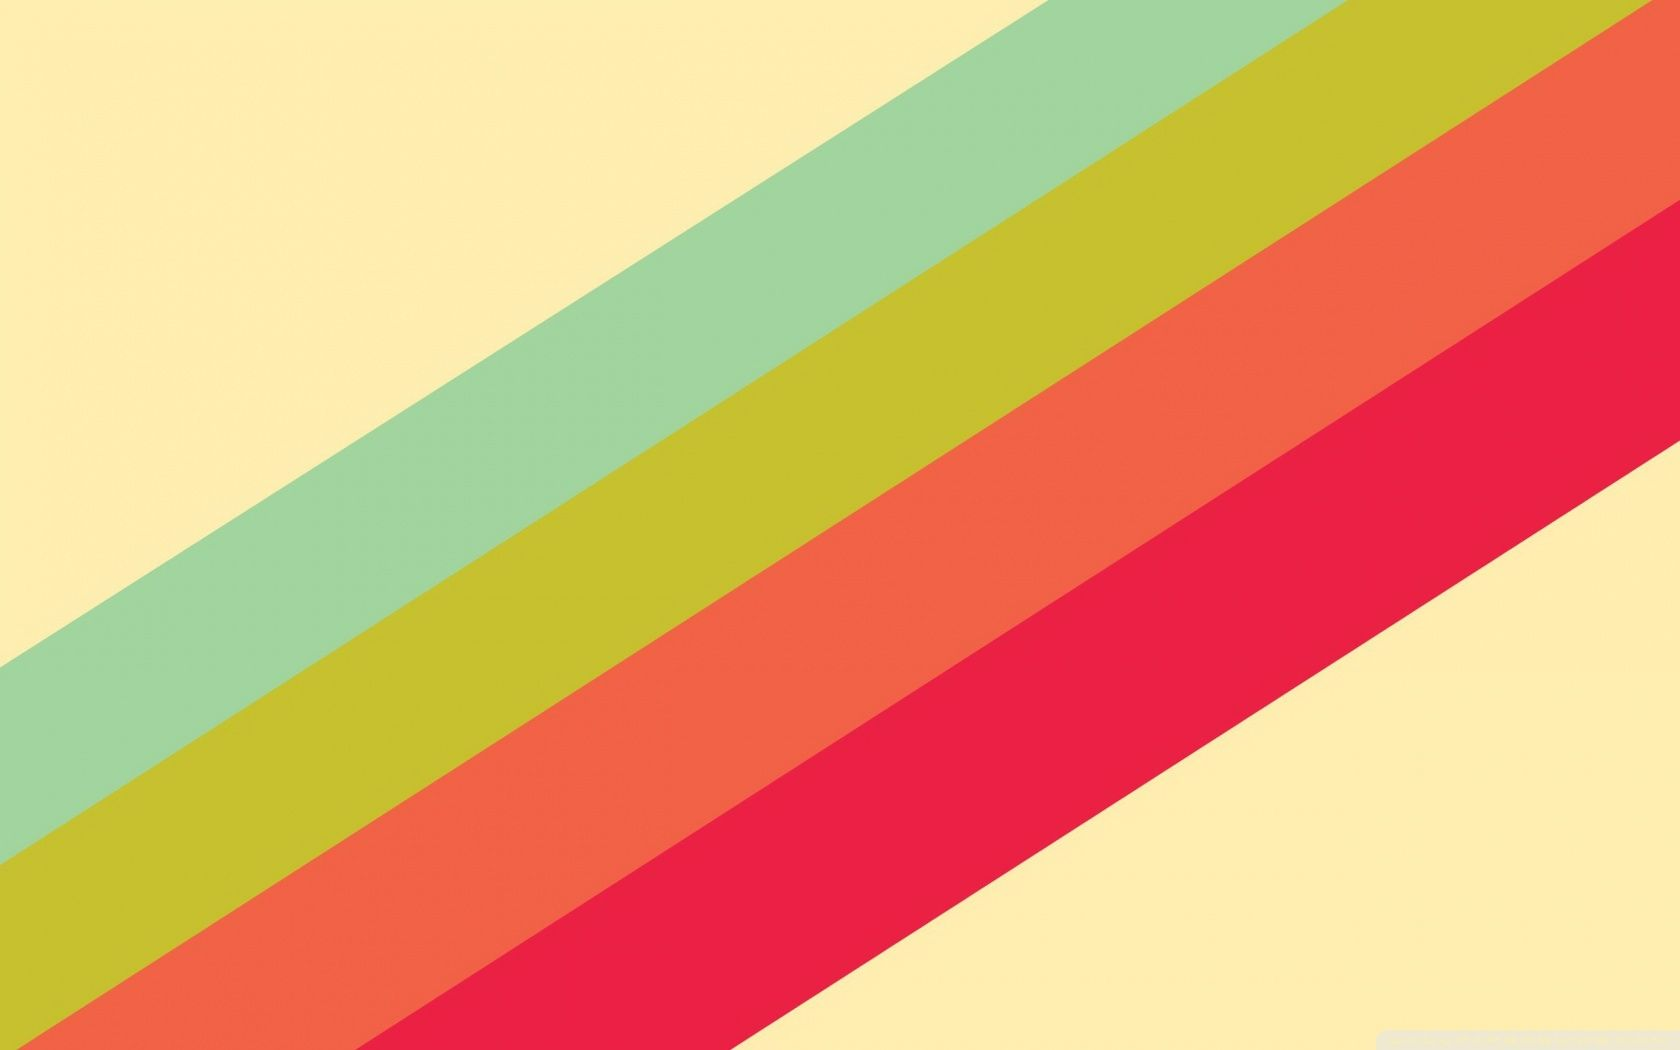 Retro Abstract Wallpaper Background HD Image Minimalist desktop 1680x1050